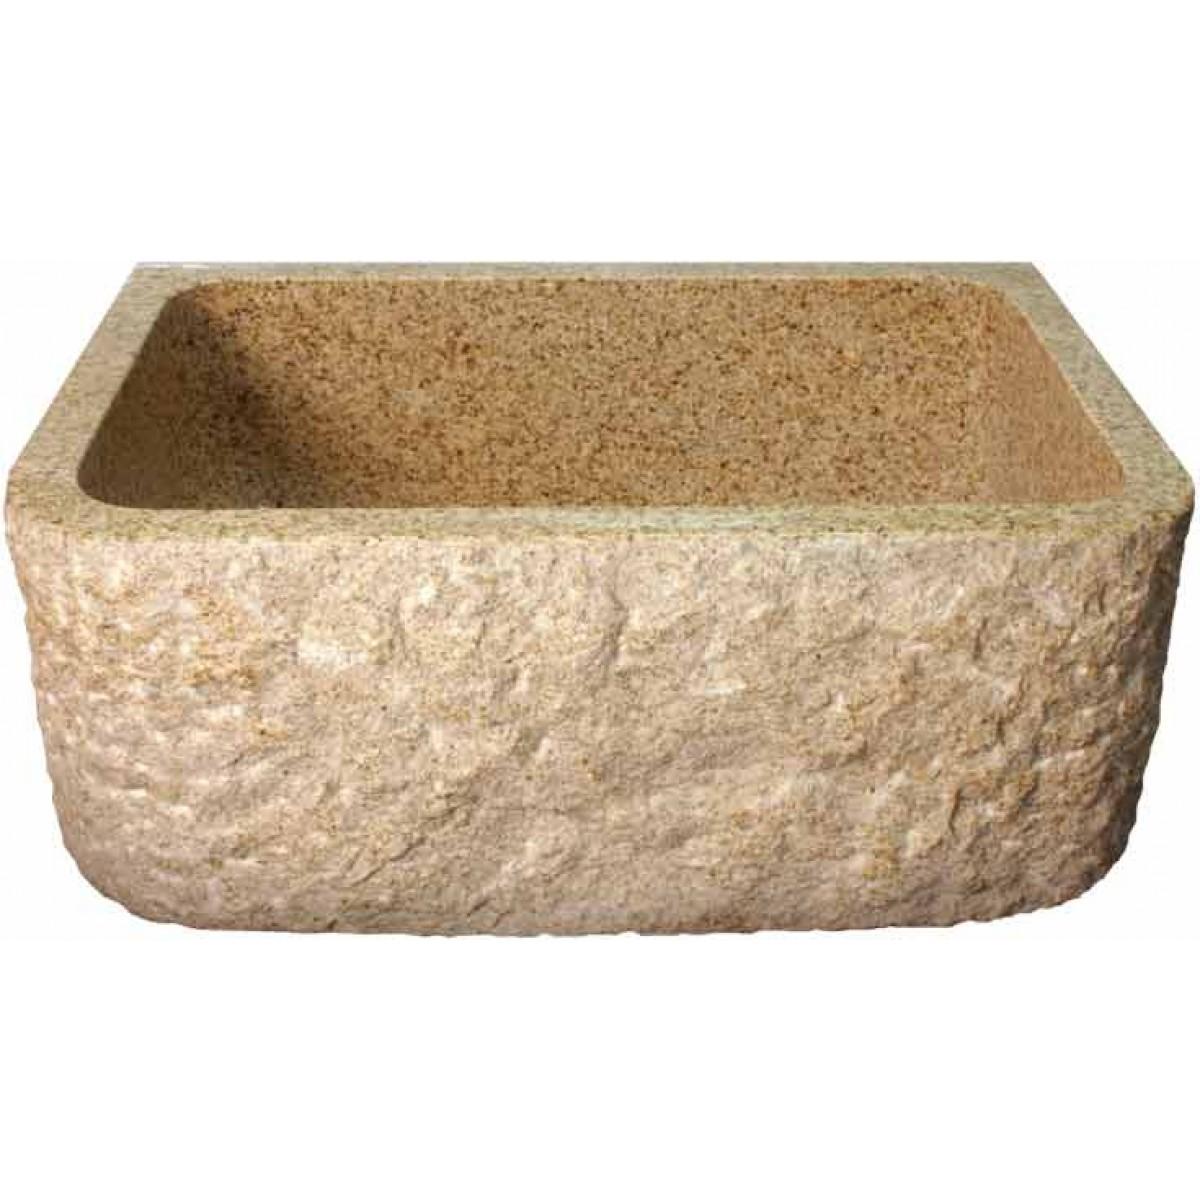 Rockwell Design Stone Granite Front Apron Farm Kitchen Sink 26 1 2 x 19 x 9